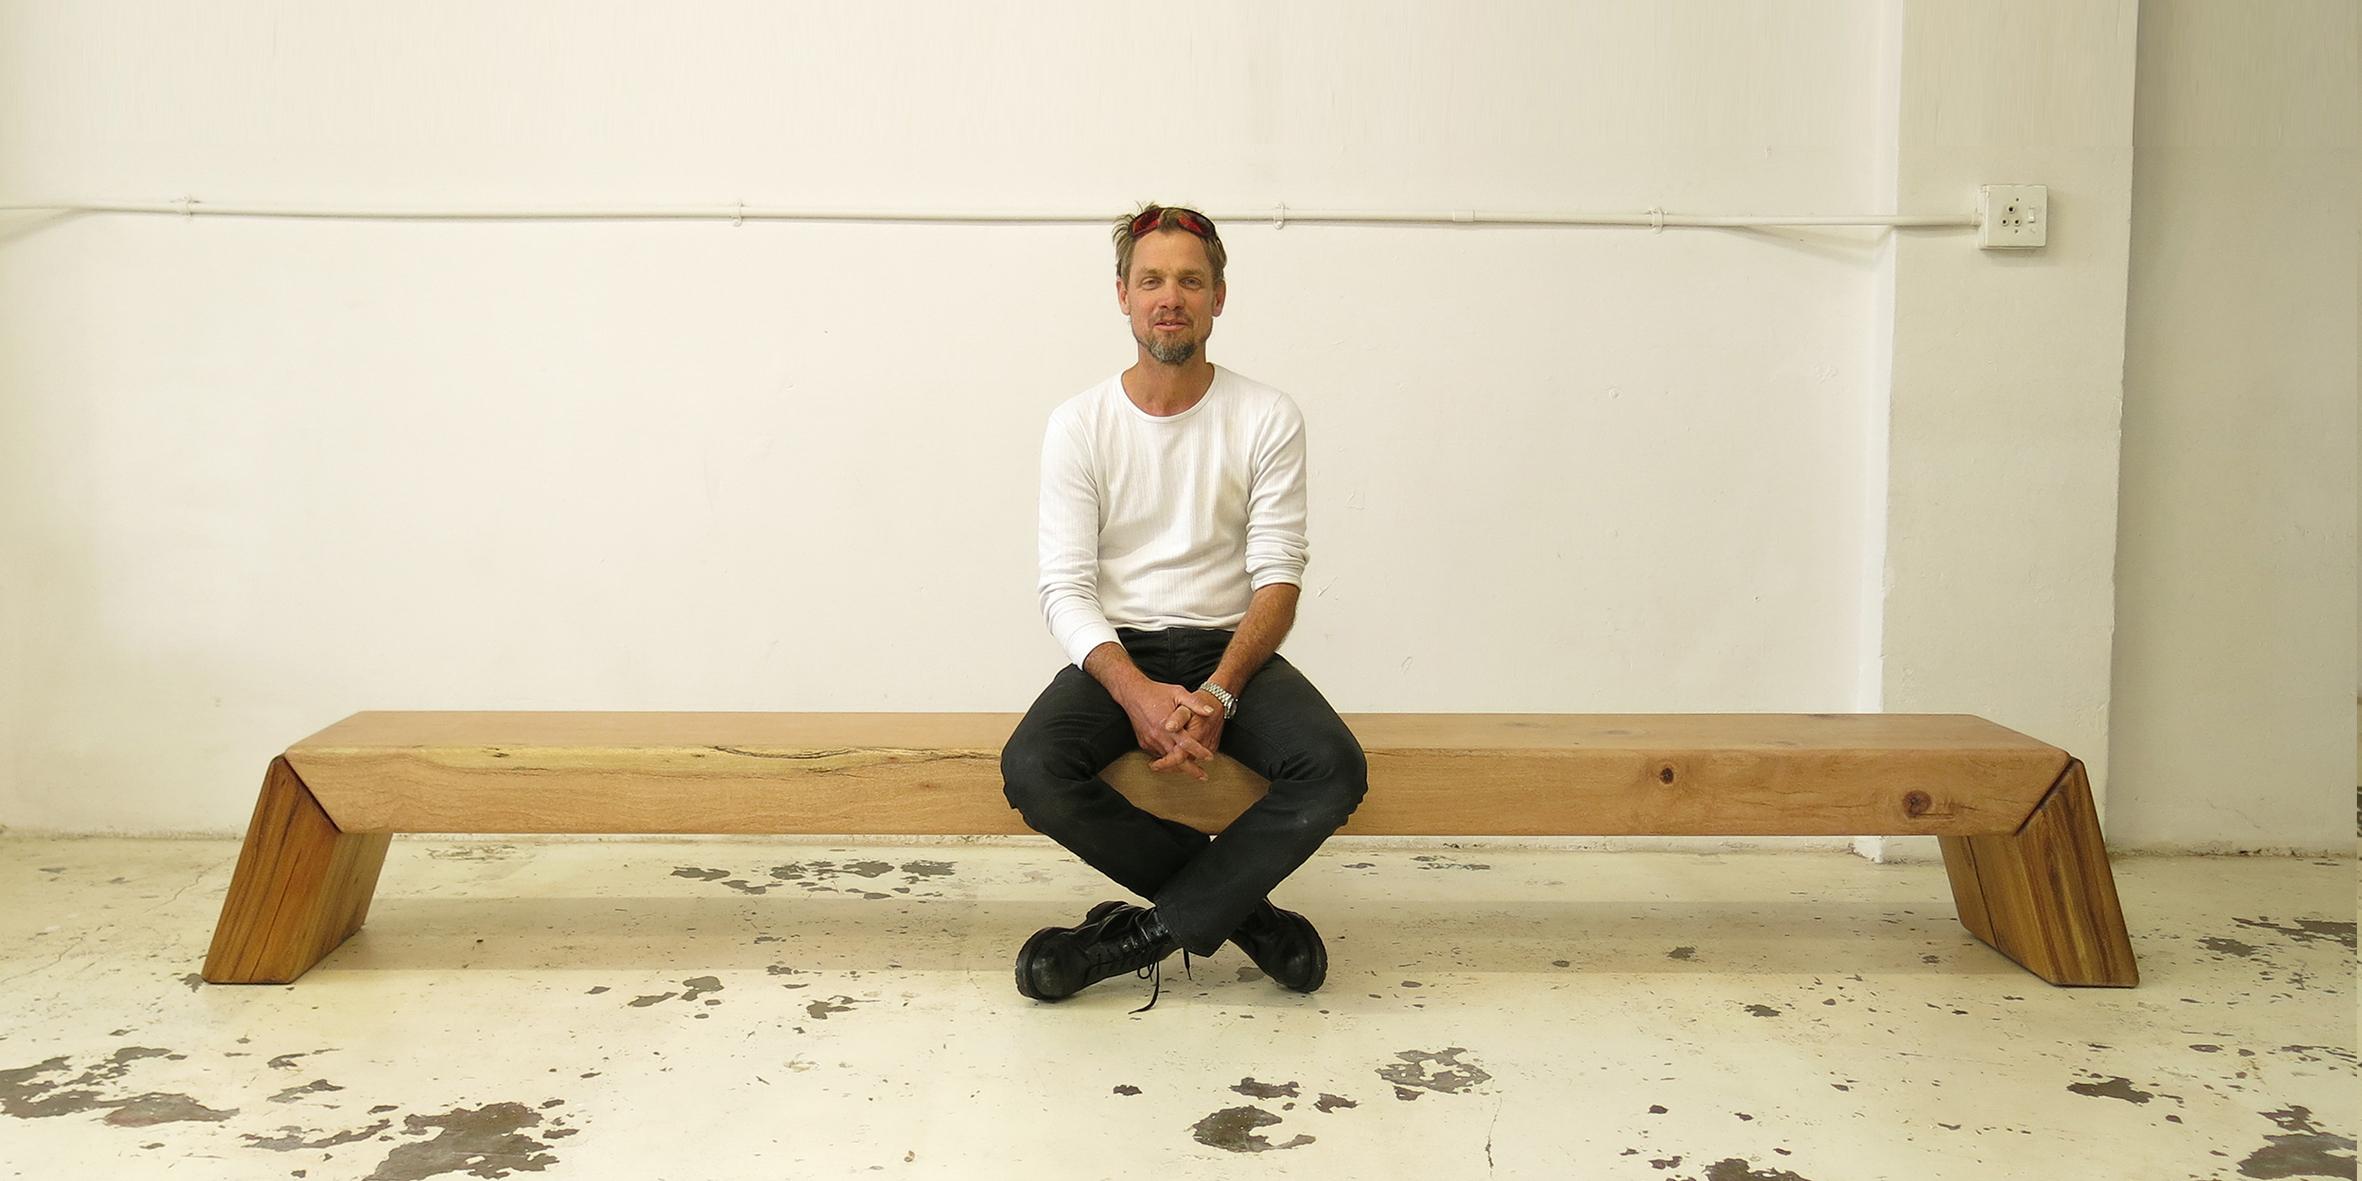 makere bench, 3000 l x 320 w x 430 h, silky oak beam with blackwood legs